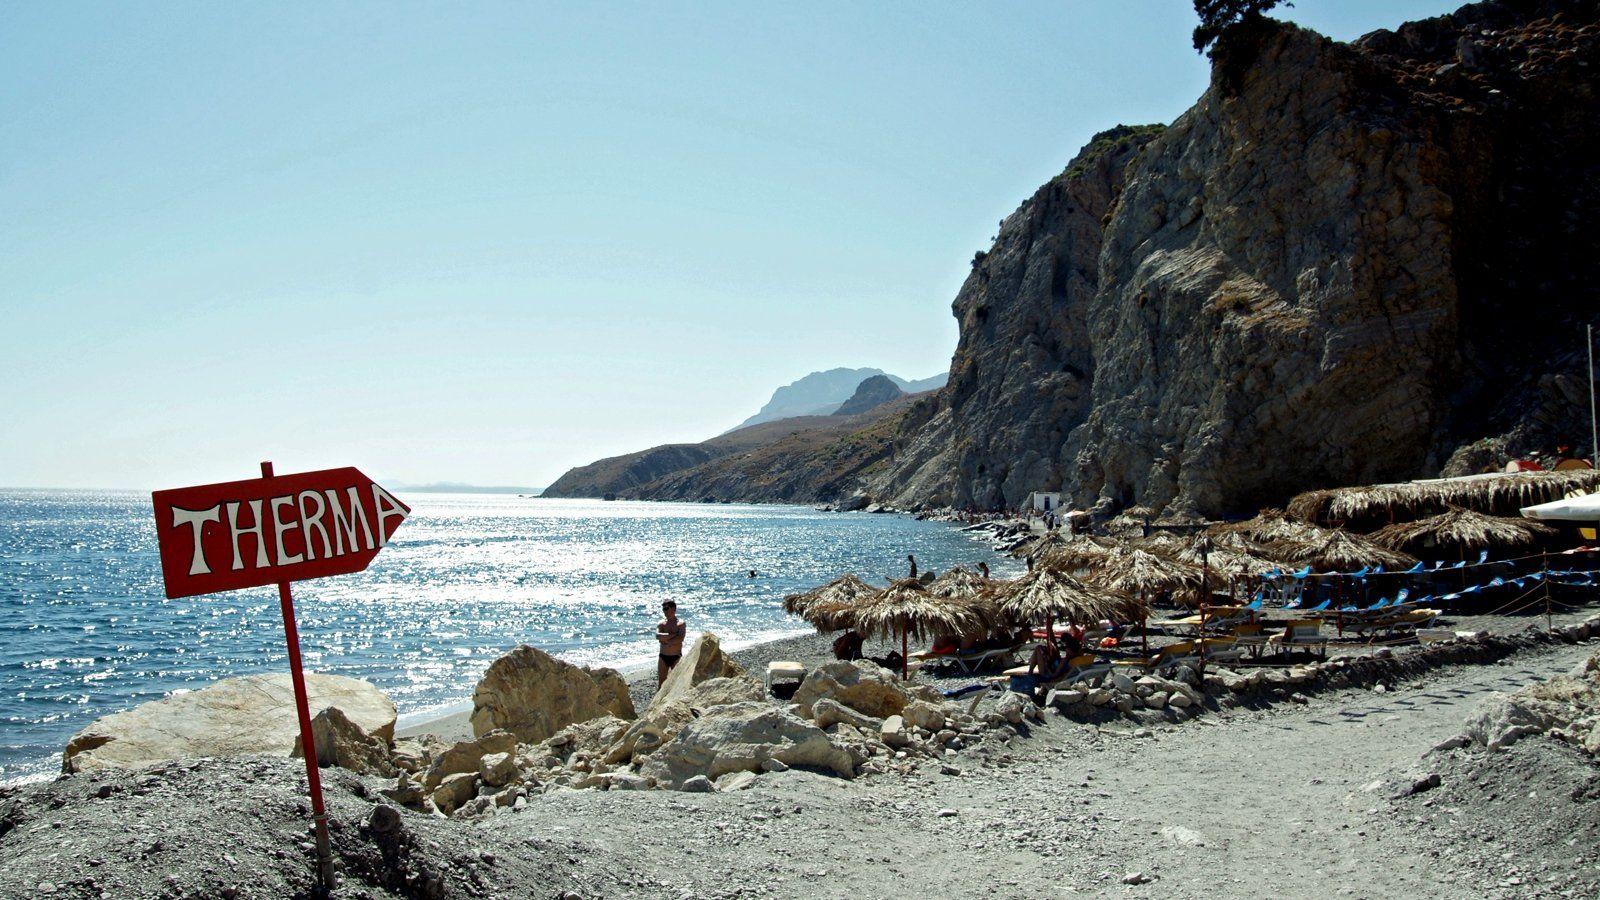 Plaja Therma - insula Kos